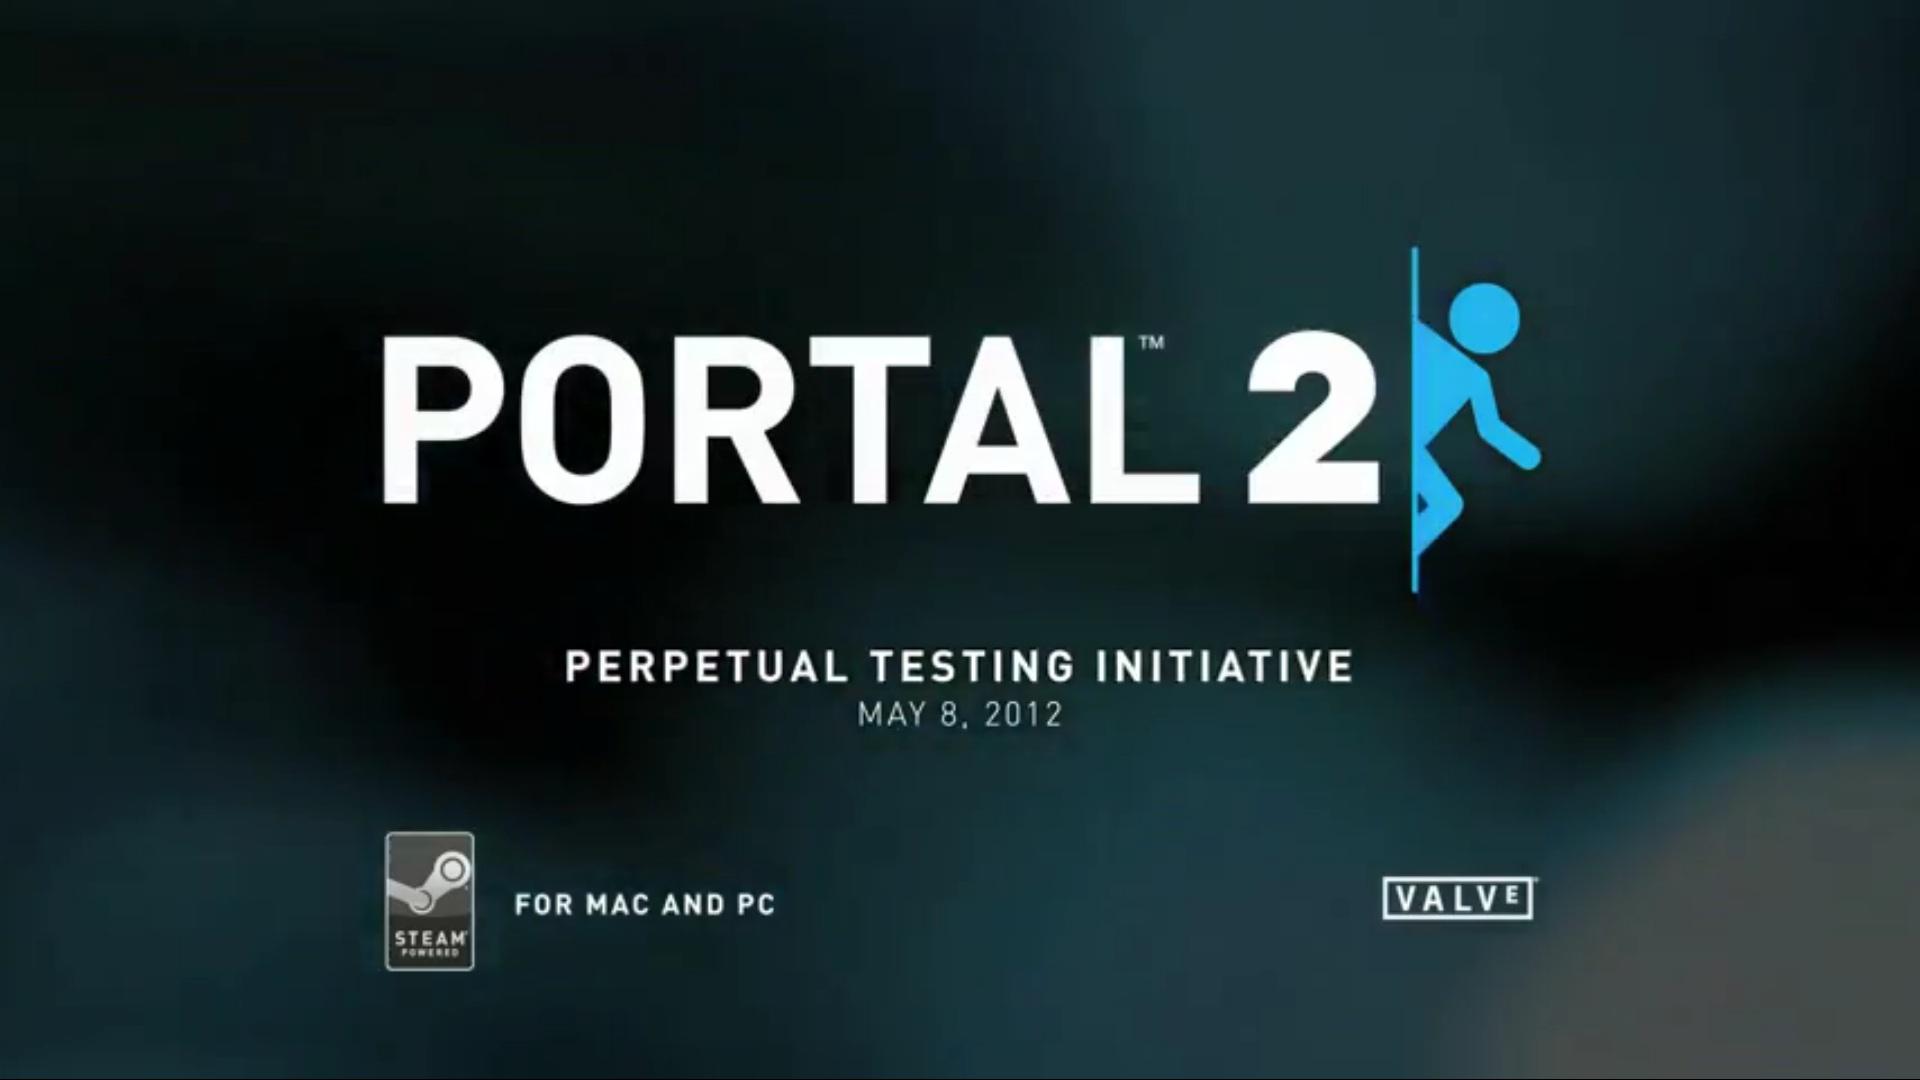 portal 2 getting free custom map editor dlc thats it guys